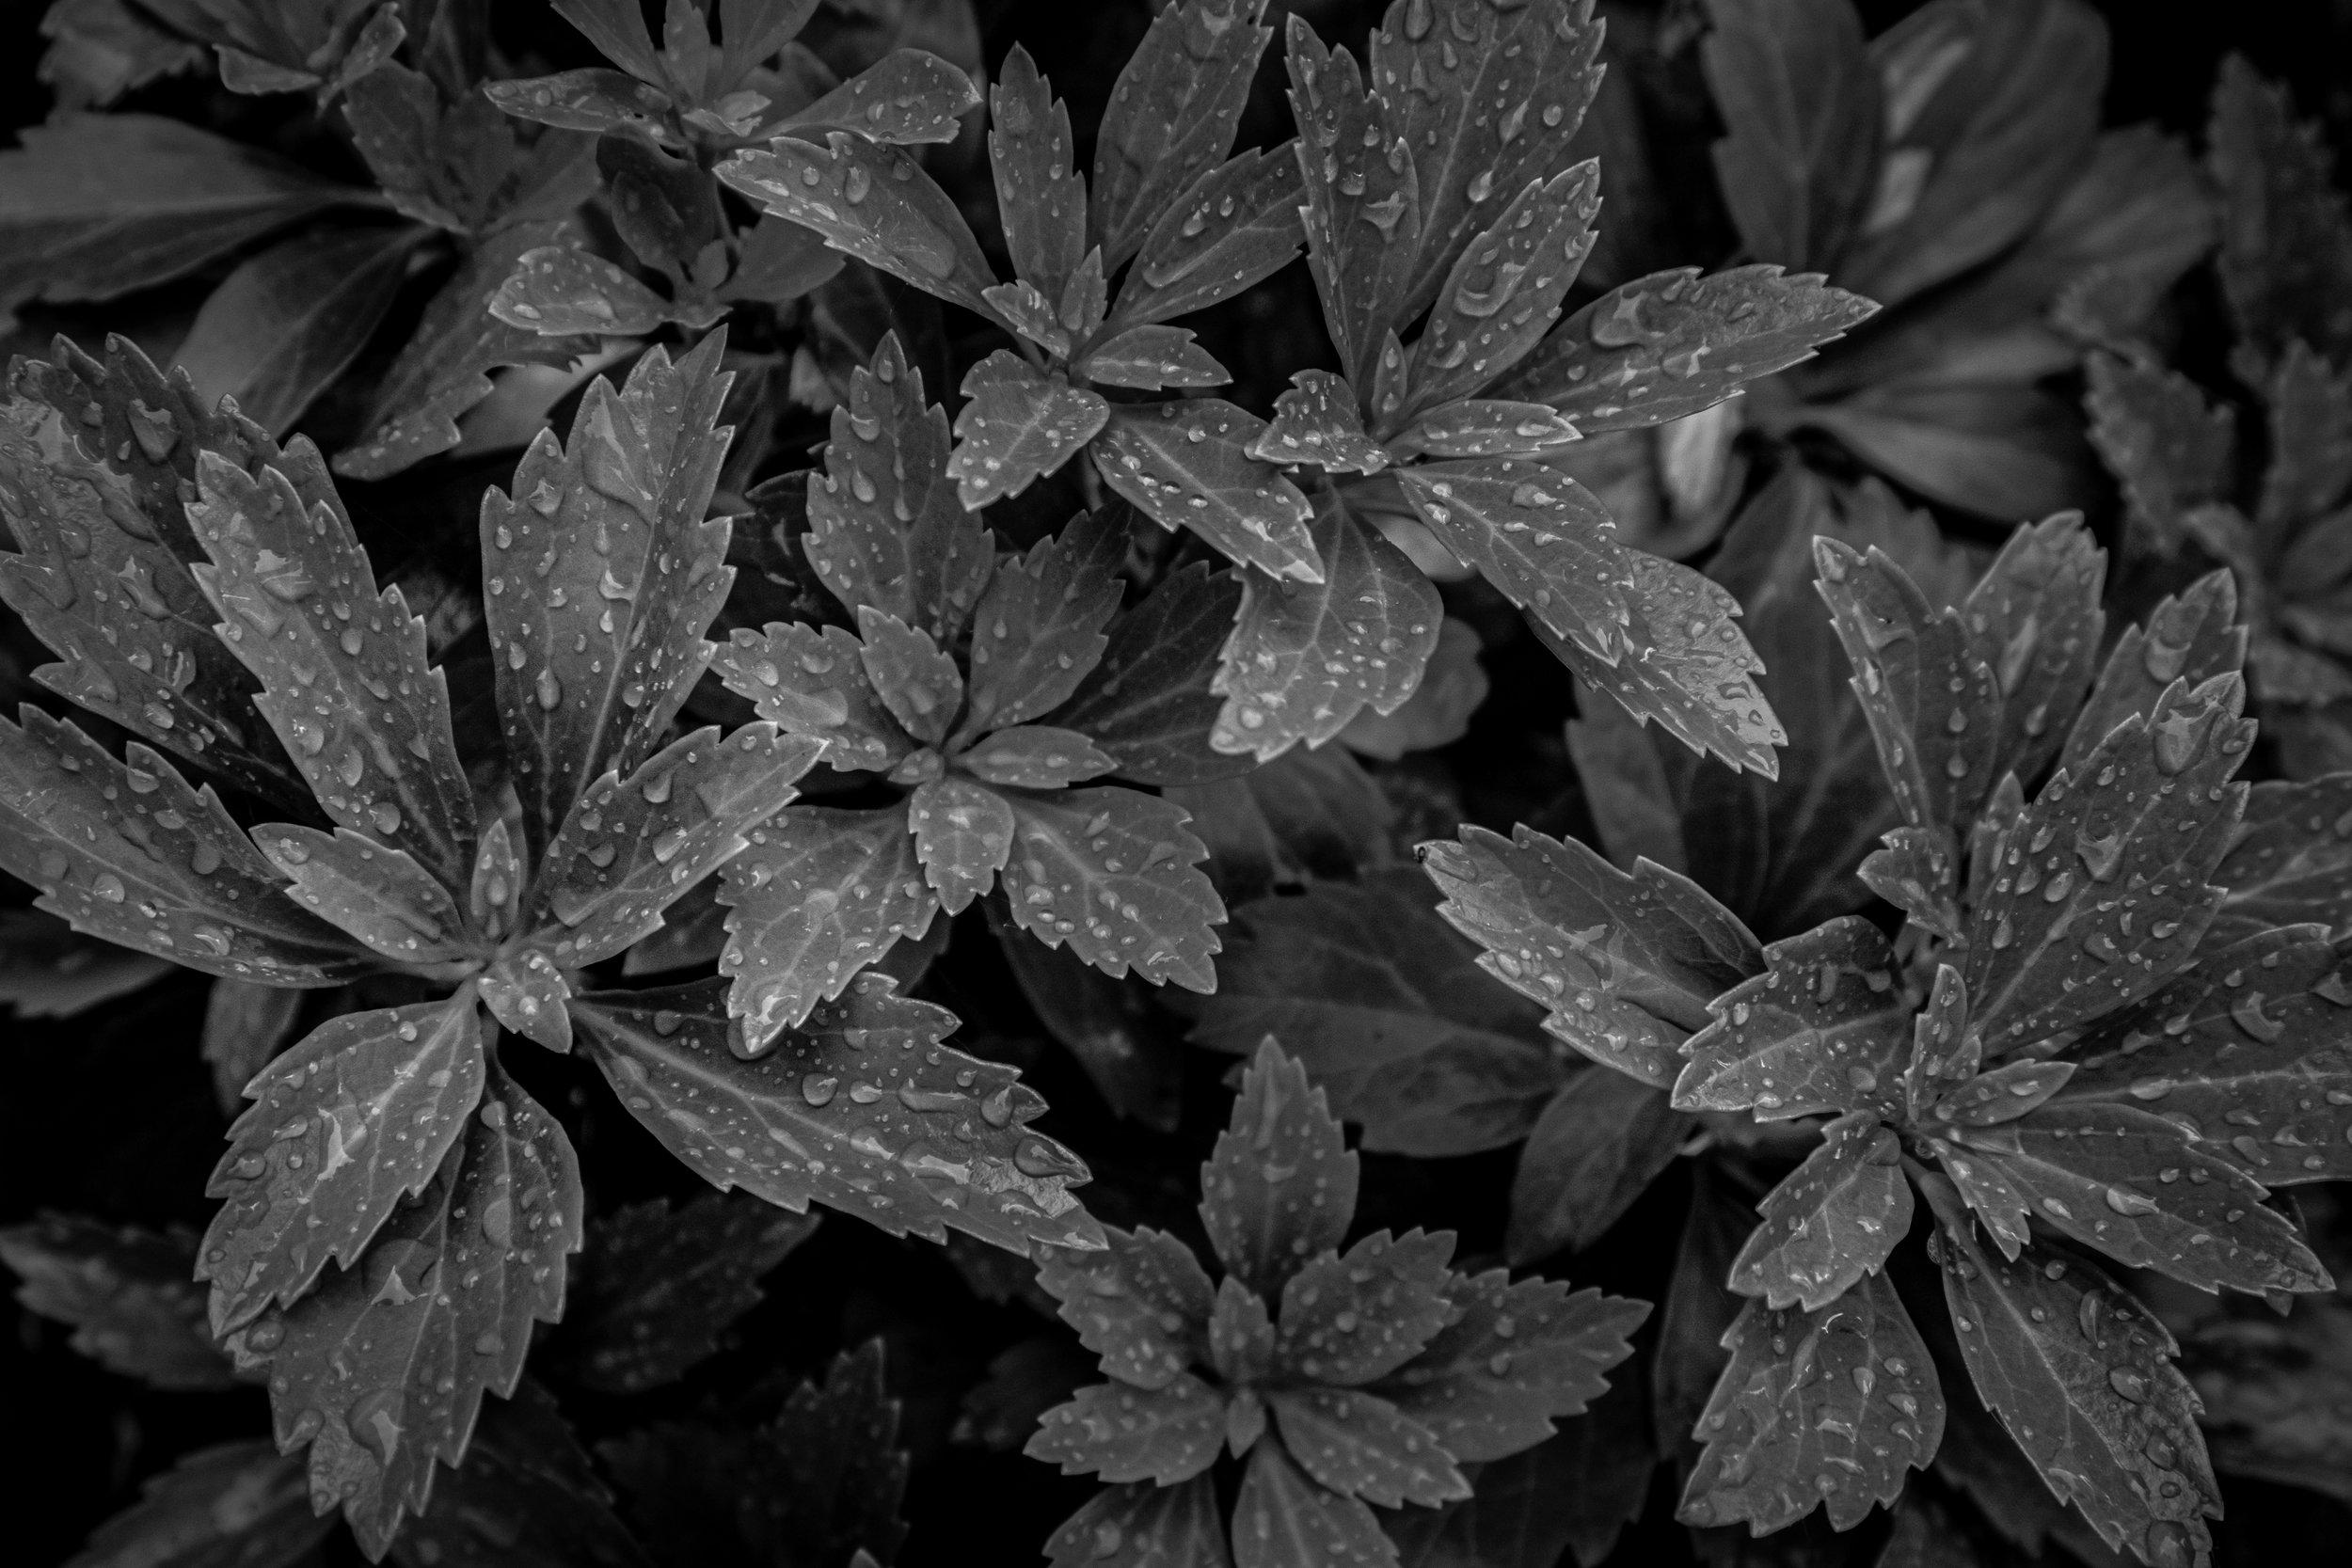 06-15-19-waterfall-foliage-woods (3 of 10).jpg